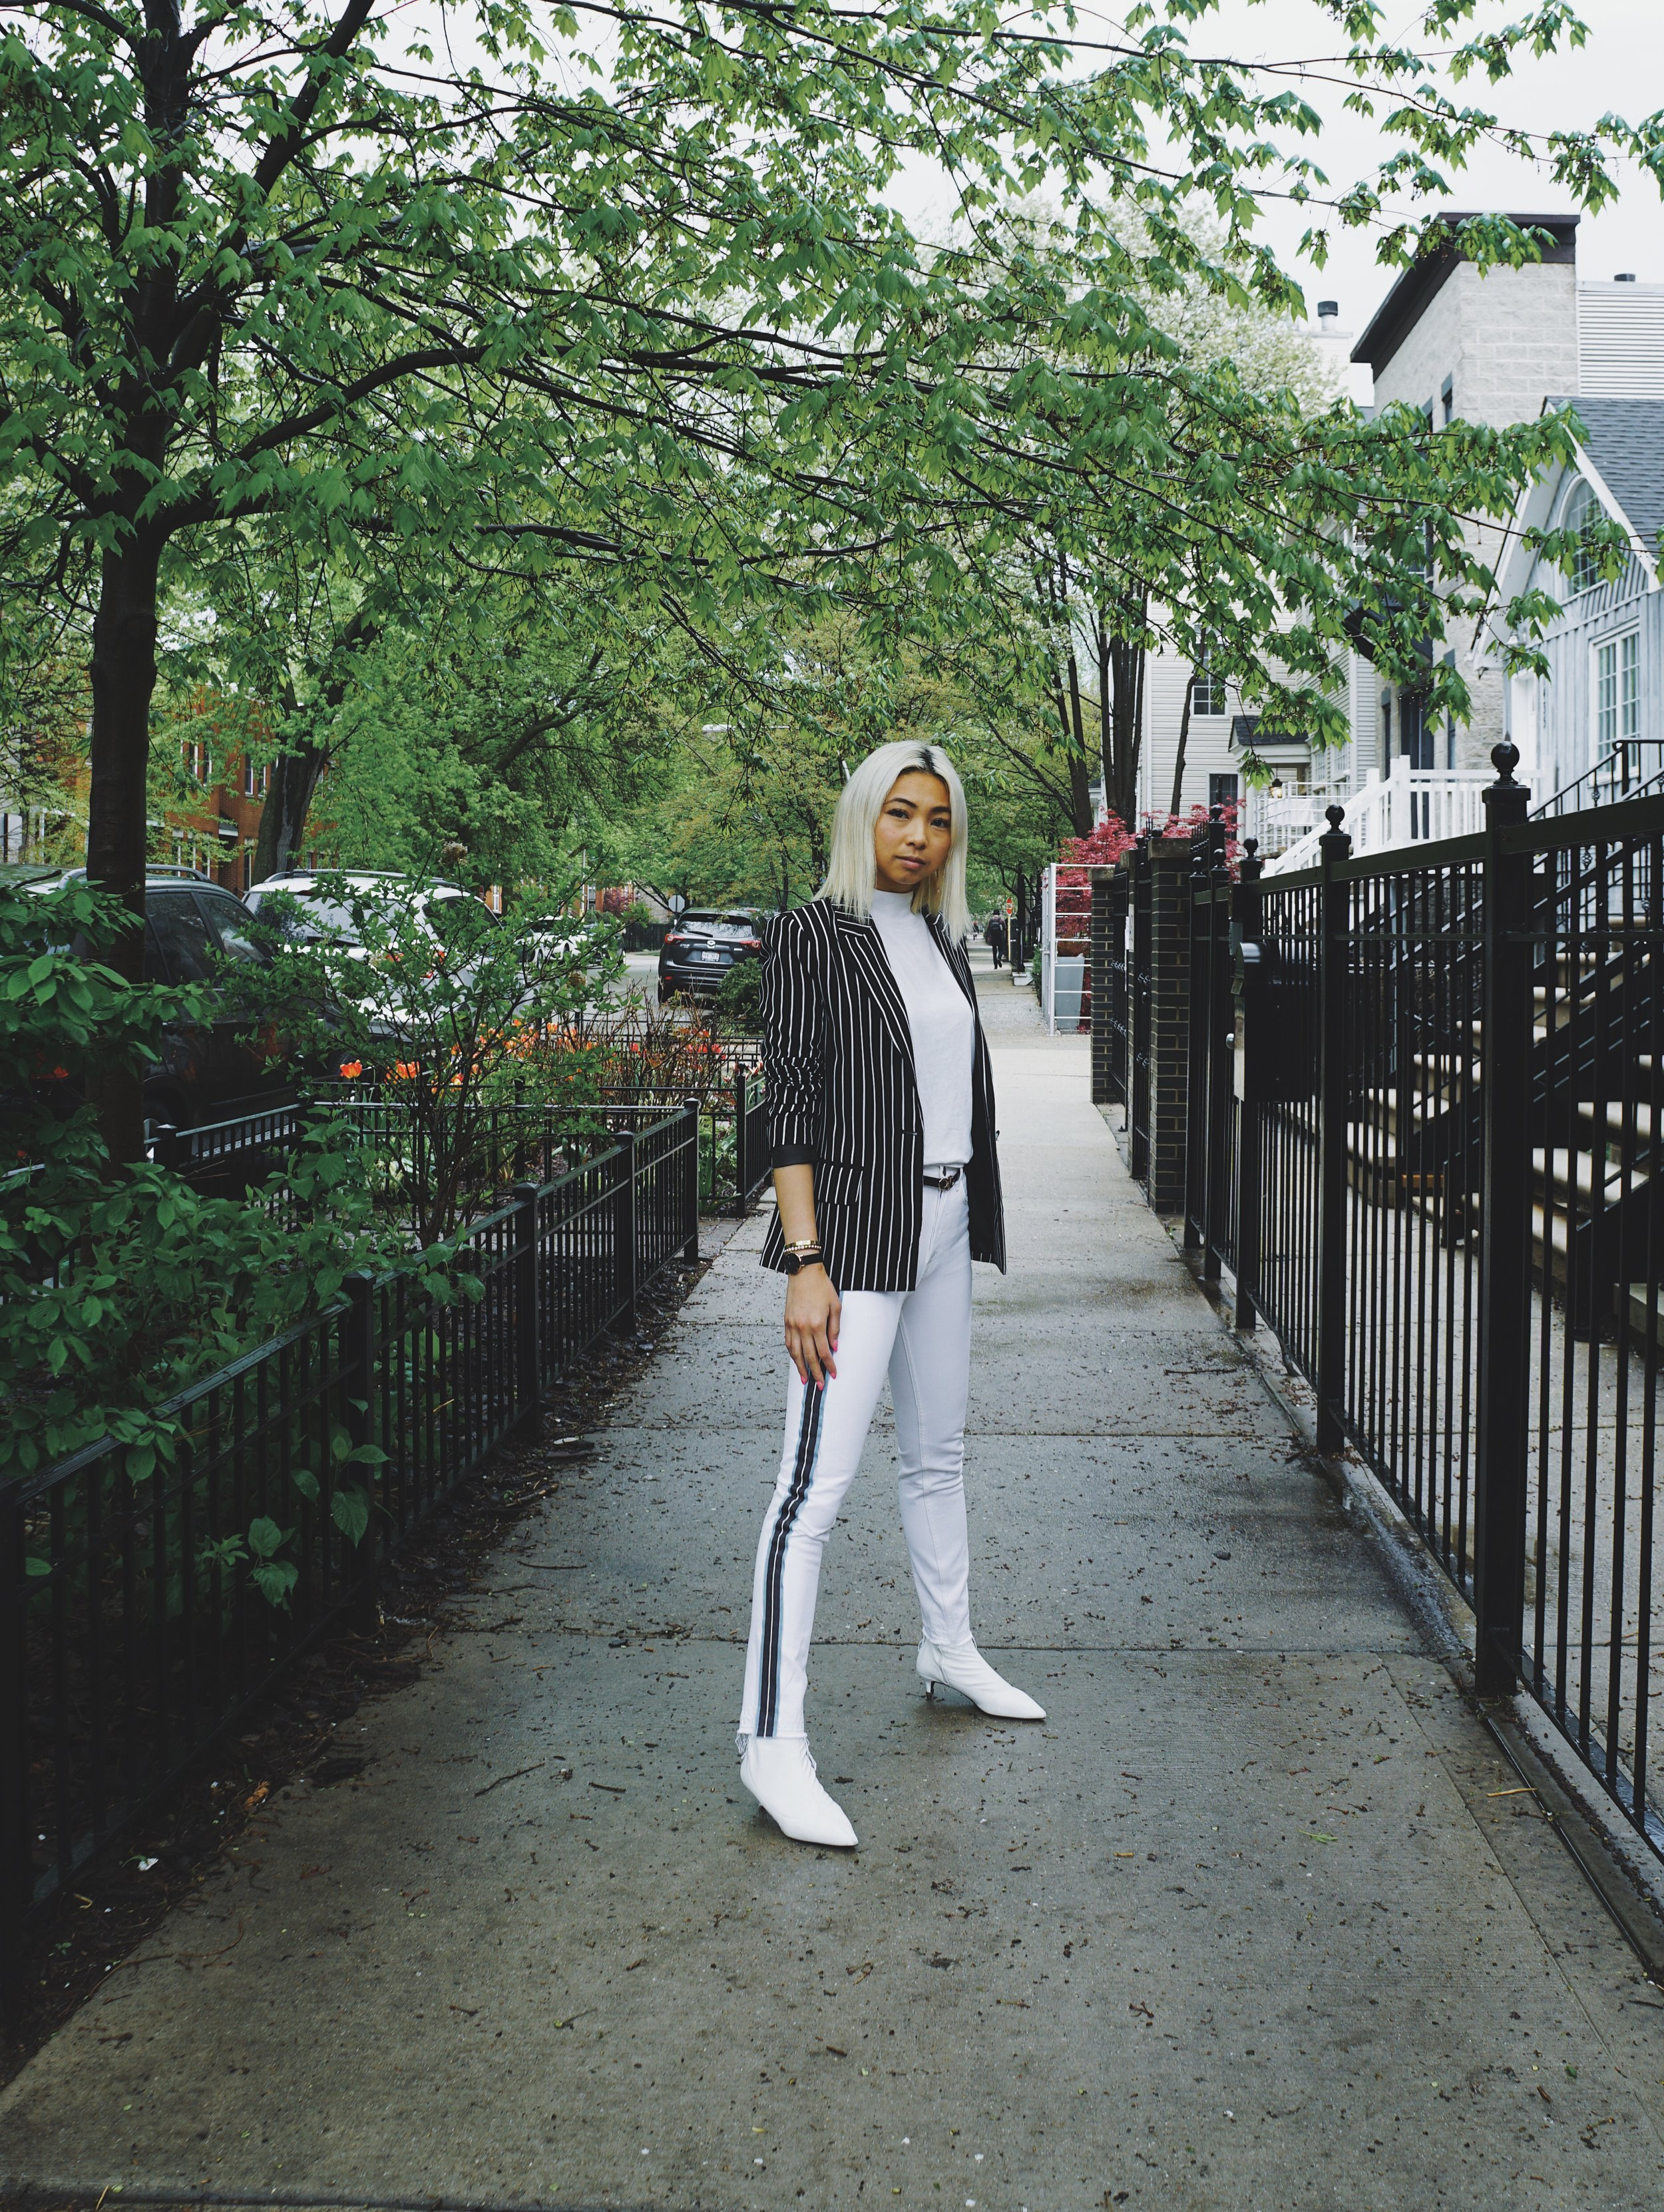 Ginger wears Monki Tailored Popper Detail Stripe Blazer,  Asos ; turtleneck top,  Calvin Klein ; Ceylon Leather belt,  Salvatore Ferragamo ; Karolina High-Rise Crop Jean,  GRLFRND ; Marilyn Kitten Heel,  Free People .